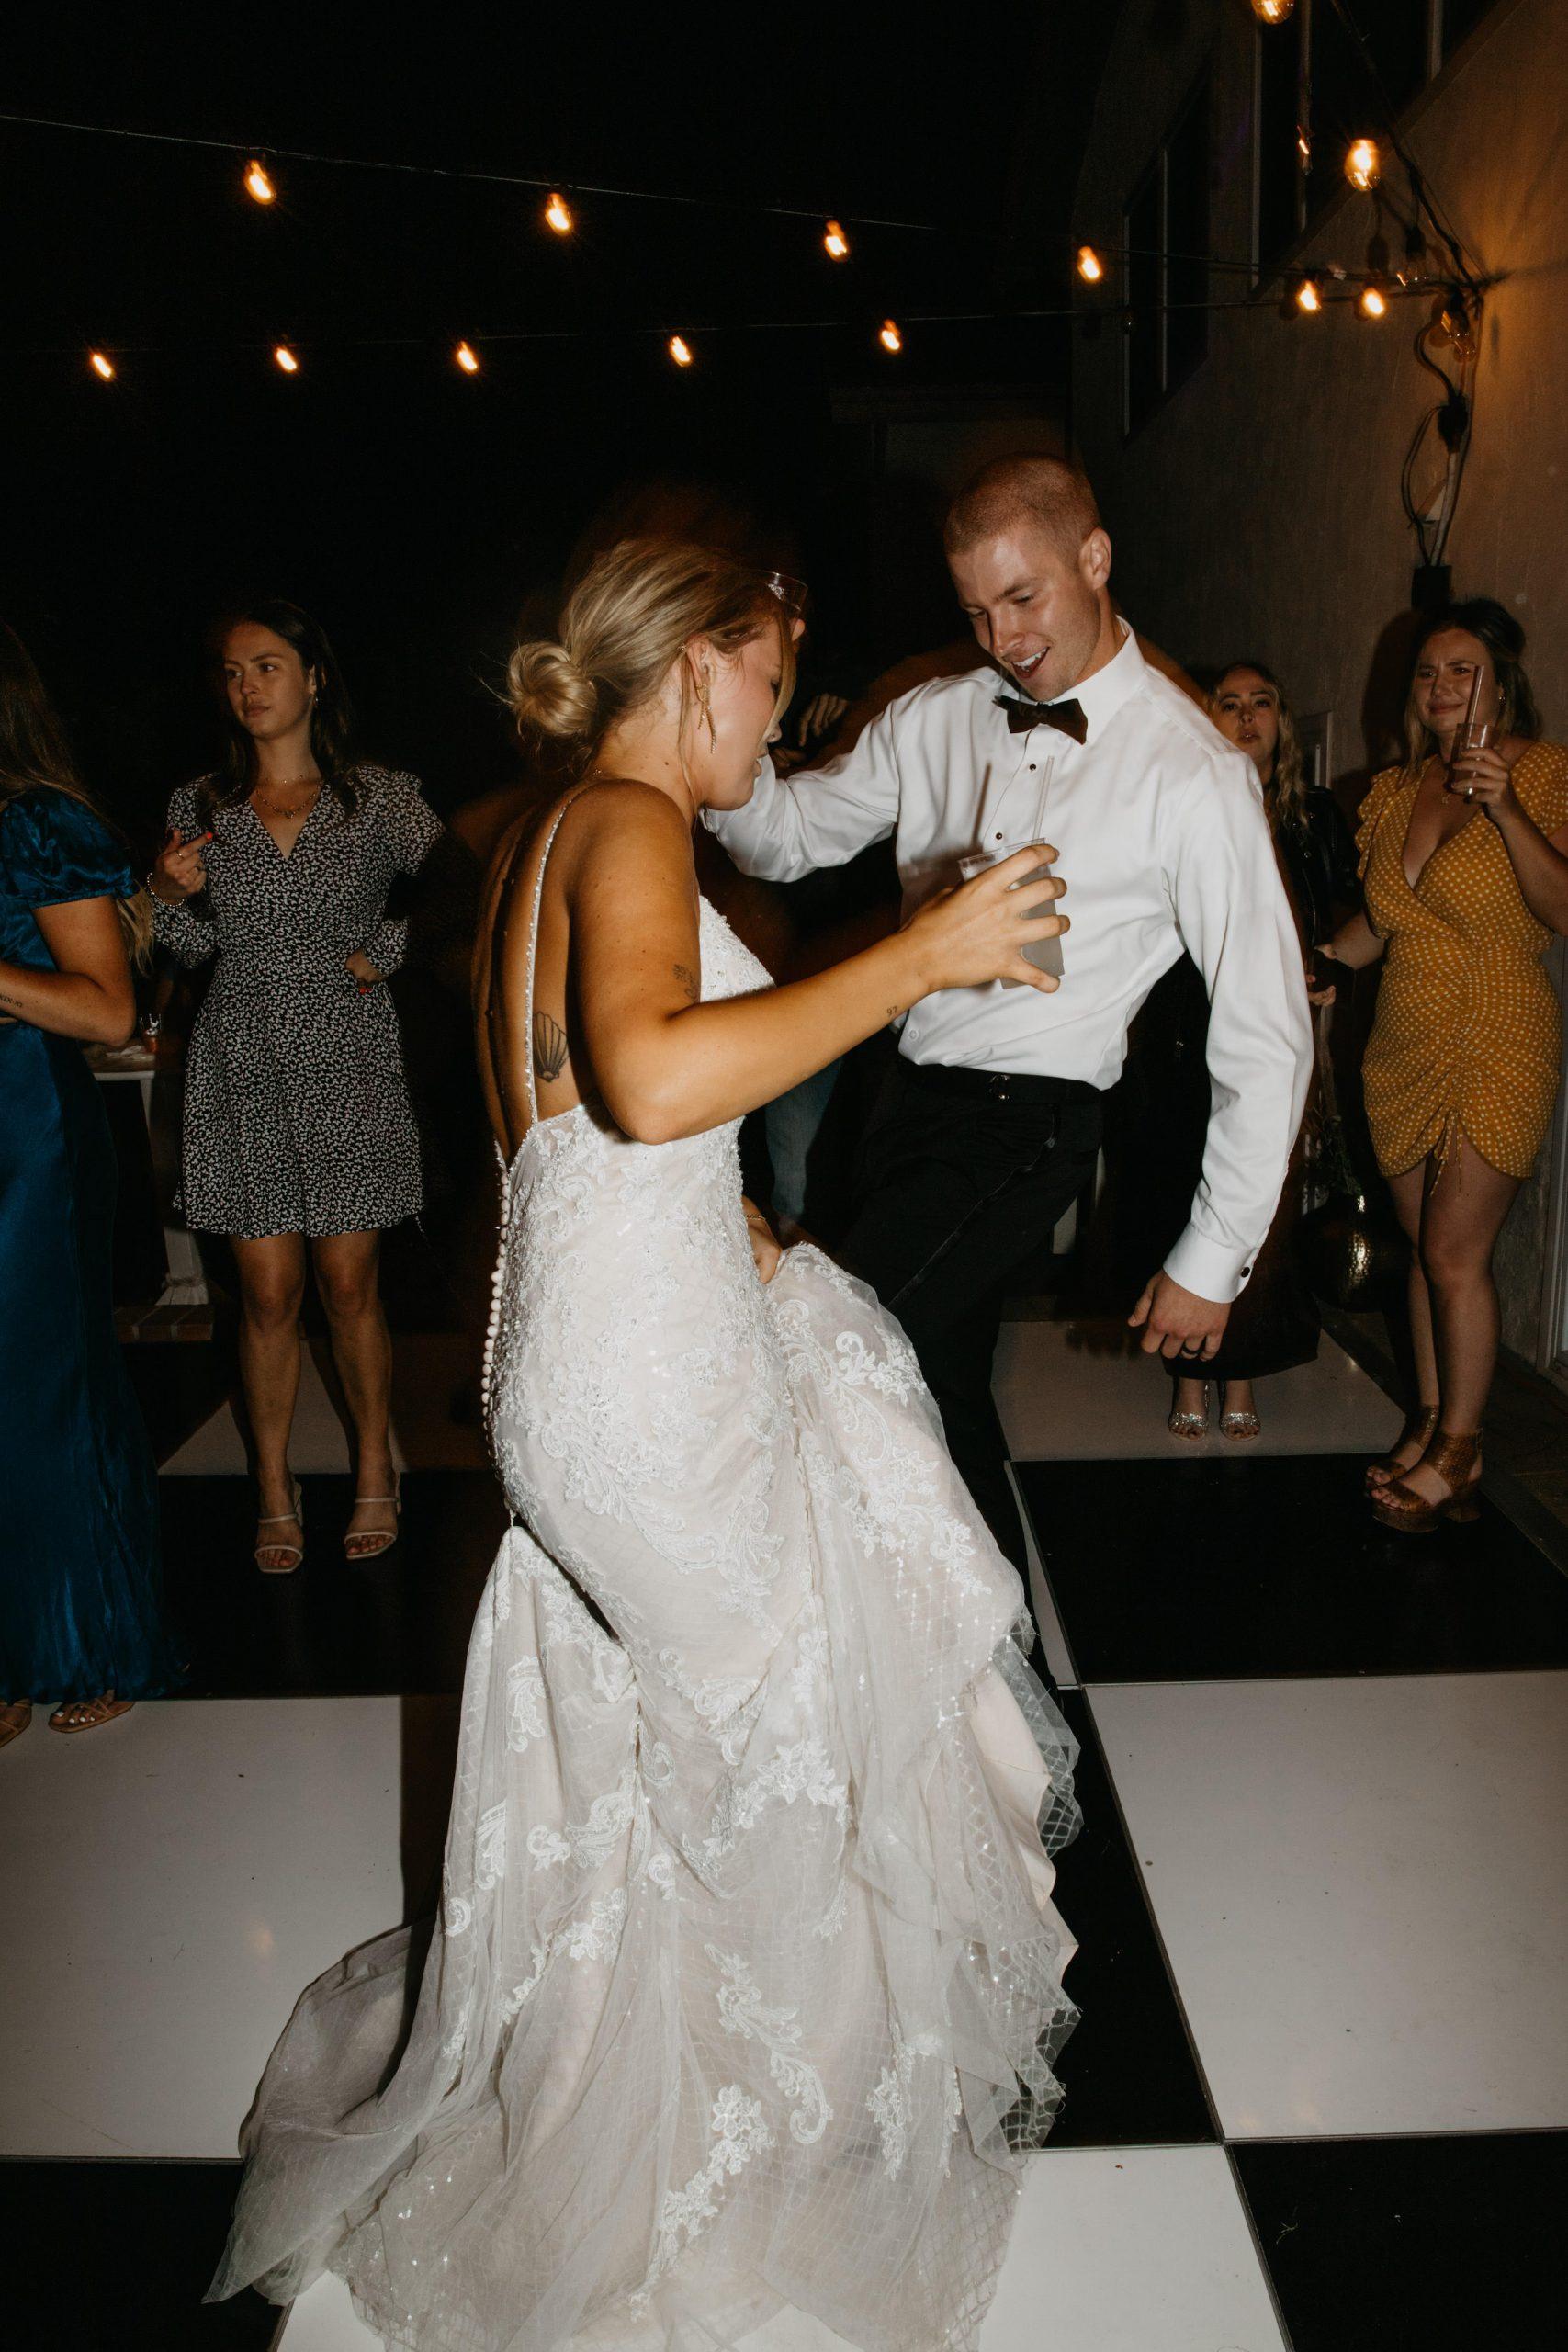 Bride and groom dancing in Laguna Beach Backyard Wedding, image by Fatima Elreda Photo